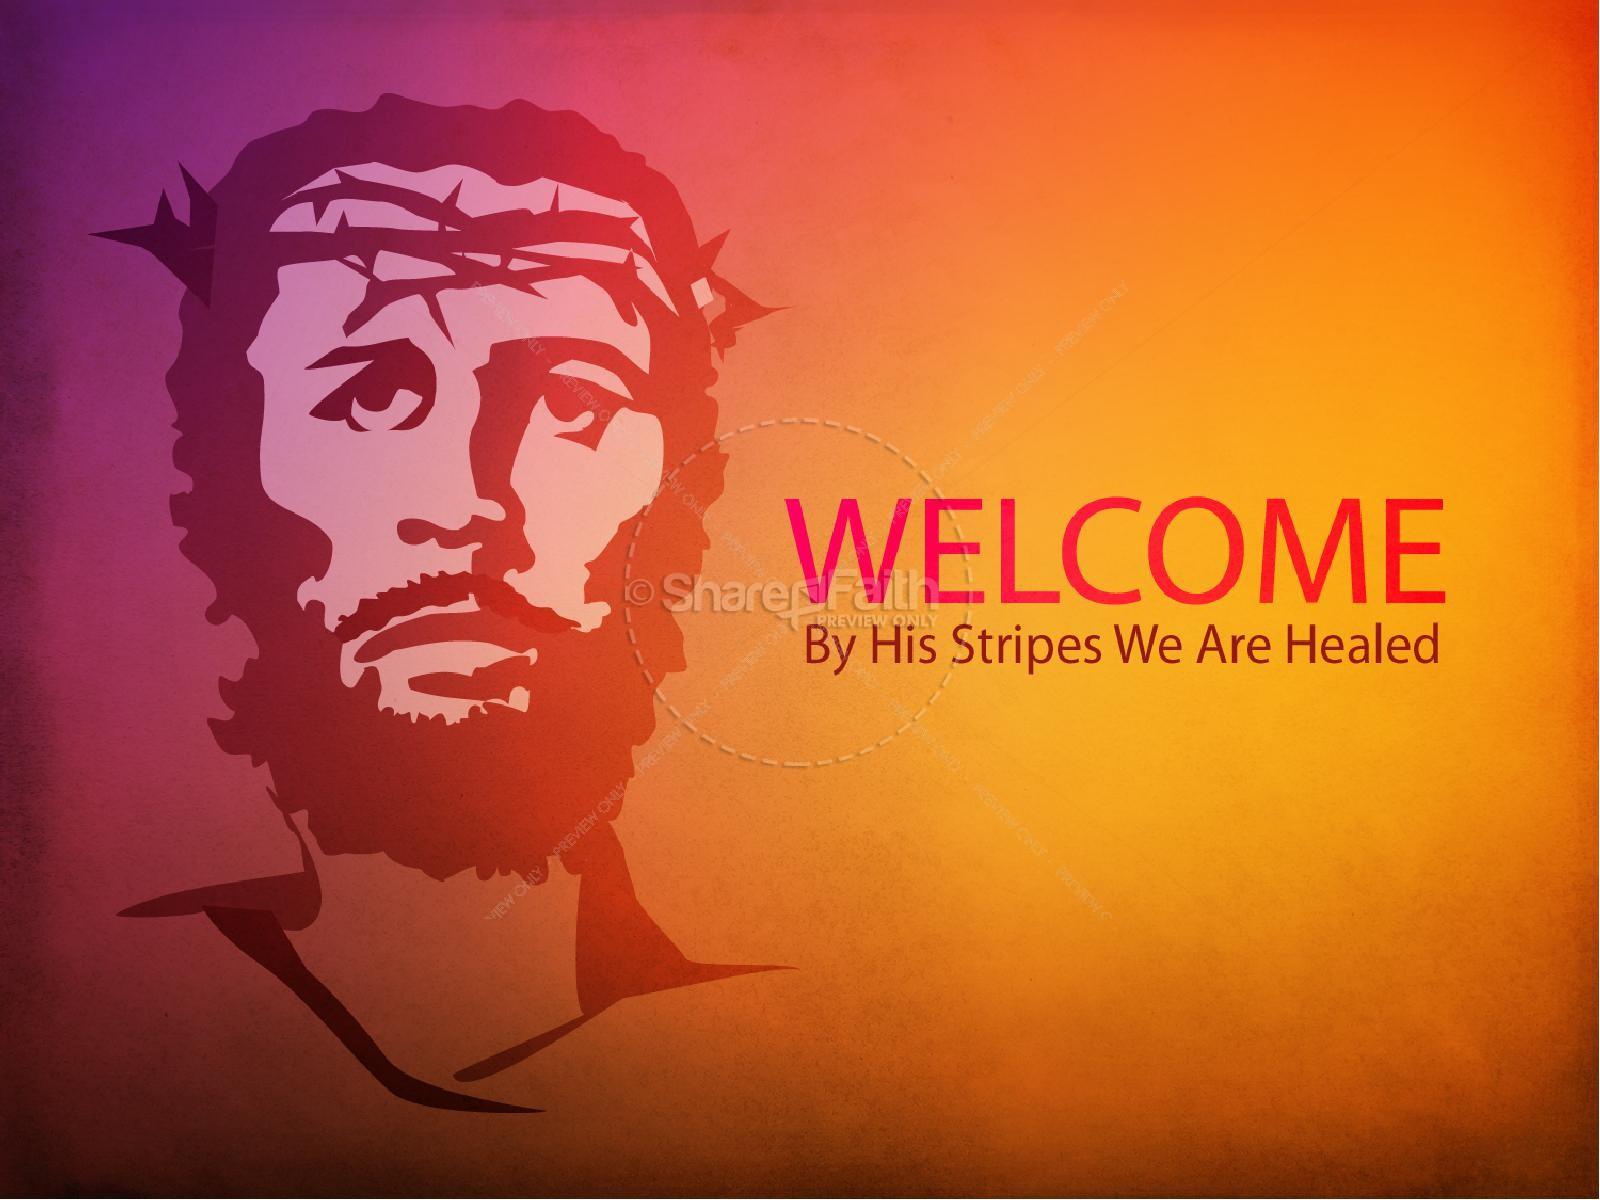 Jesus on the Cross PowerPoint Template | slide 2